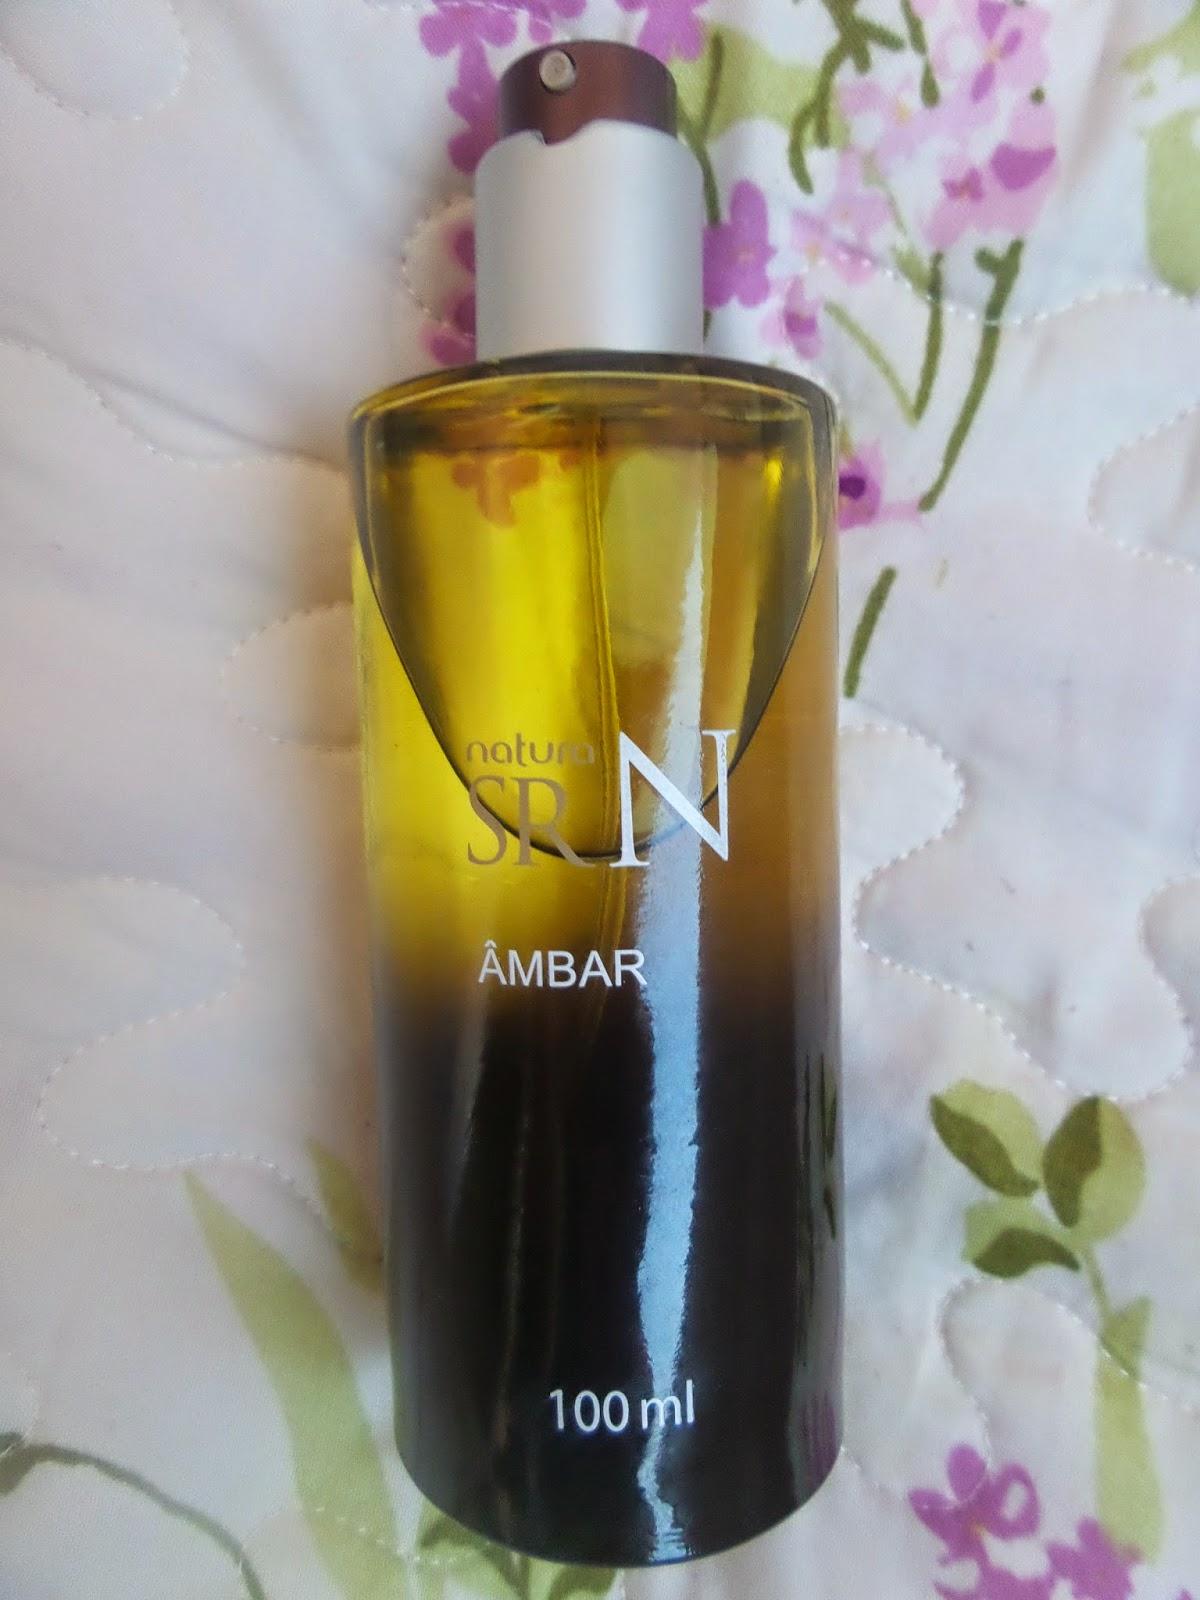 Perfume Cítrico  Sr N Âmbar Desodorante Colônia:  Masculino